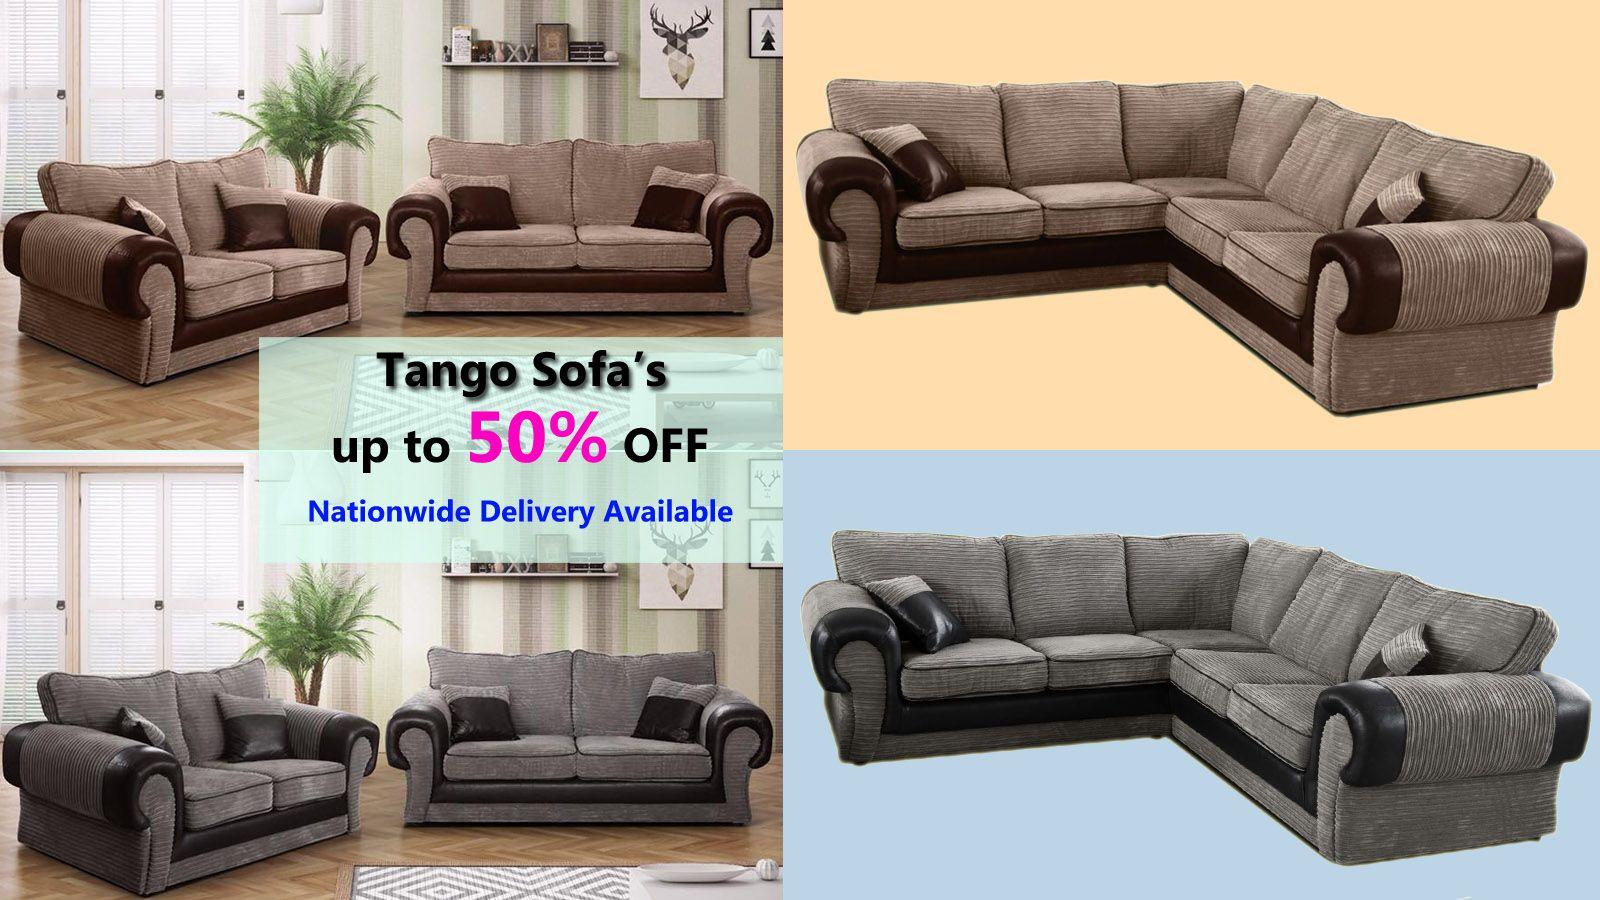 Tango Sofa Living Room Set Corner Sofa 2 Seater 3 Seater 1 Seater Swivel Chair Footstool Up 50 Off Price Limited Living Room Sets Couches Living Room Room Set